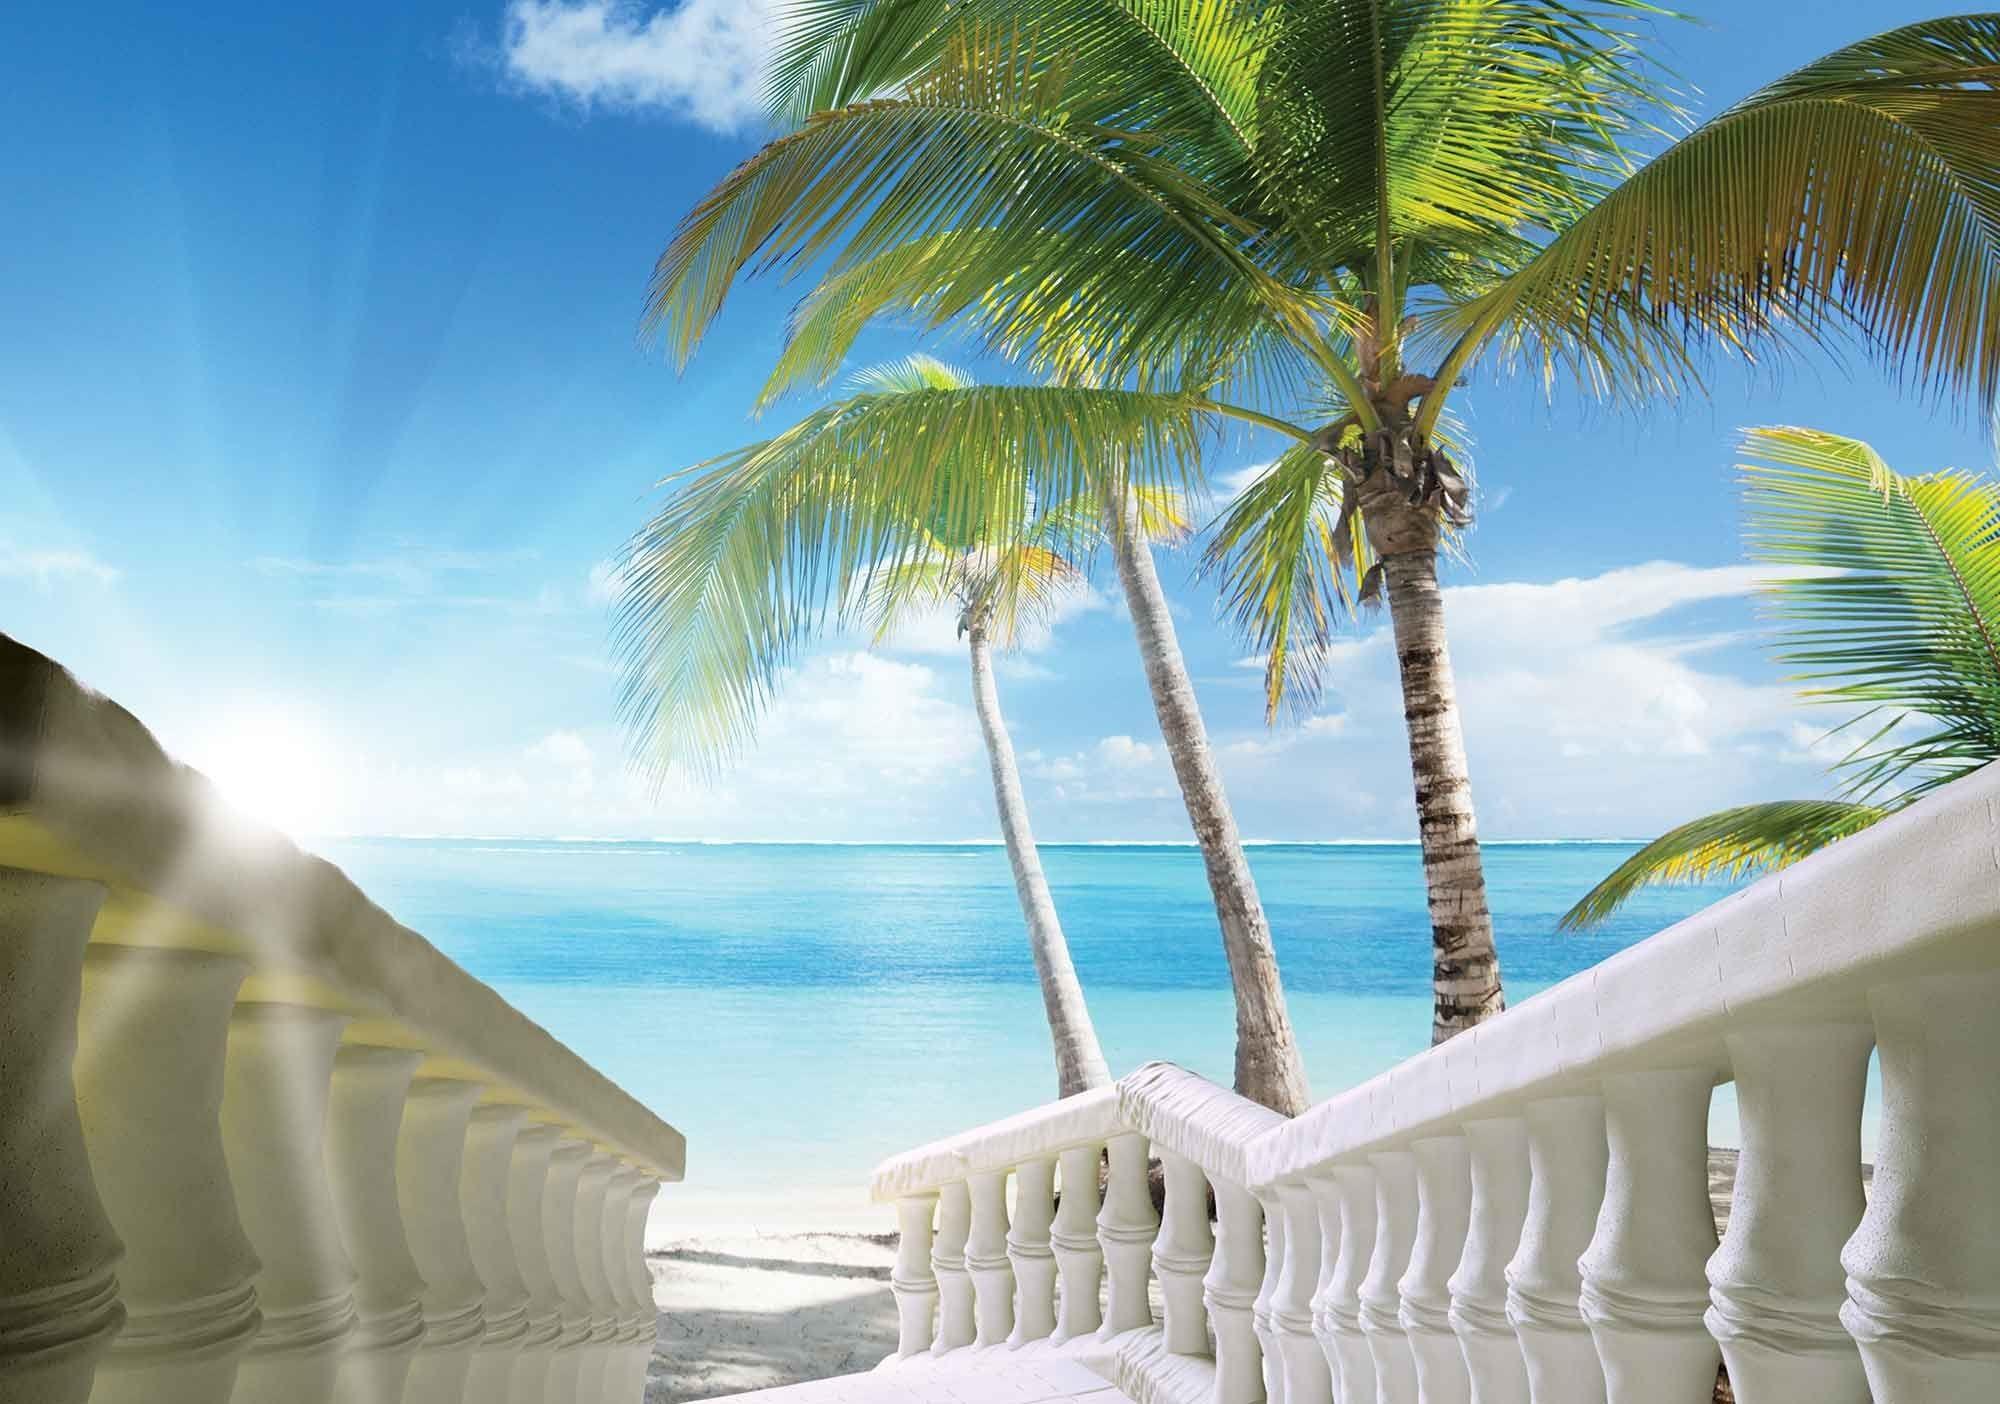 Supreme Girl Wallpaper Hd Tropical Beach Scenes Wallpaper 49 Images